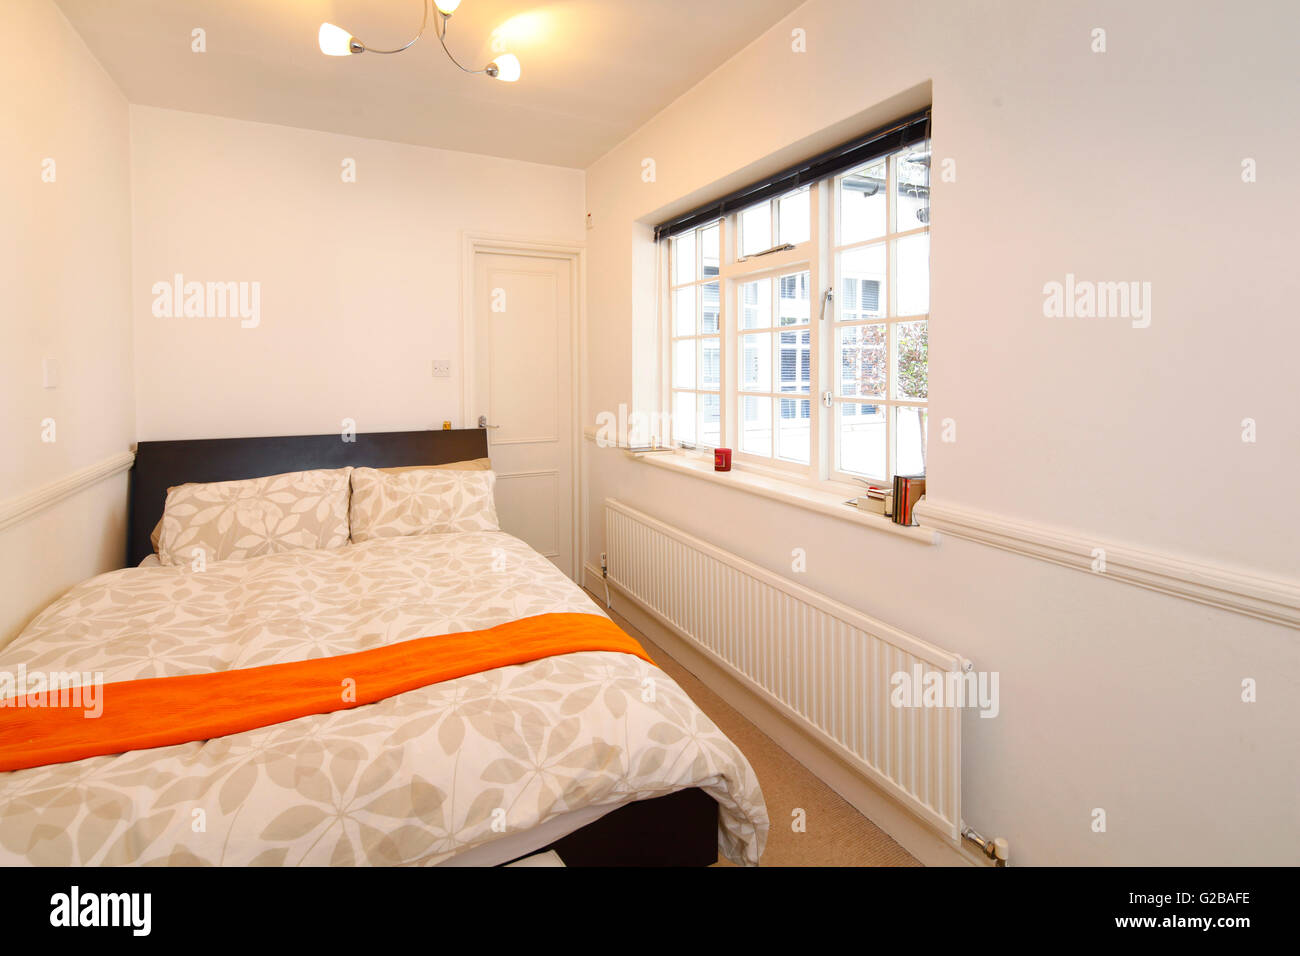 Harrington Gardens Small Bedroom With Minimal Furniture Large Stock Photo Alamy